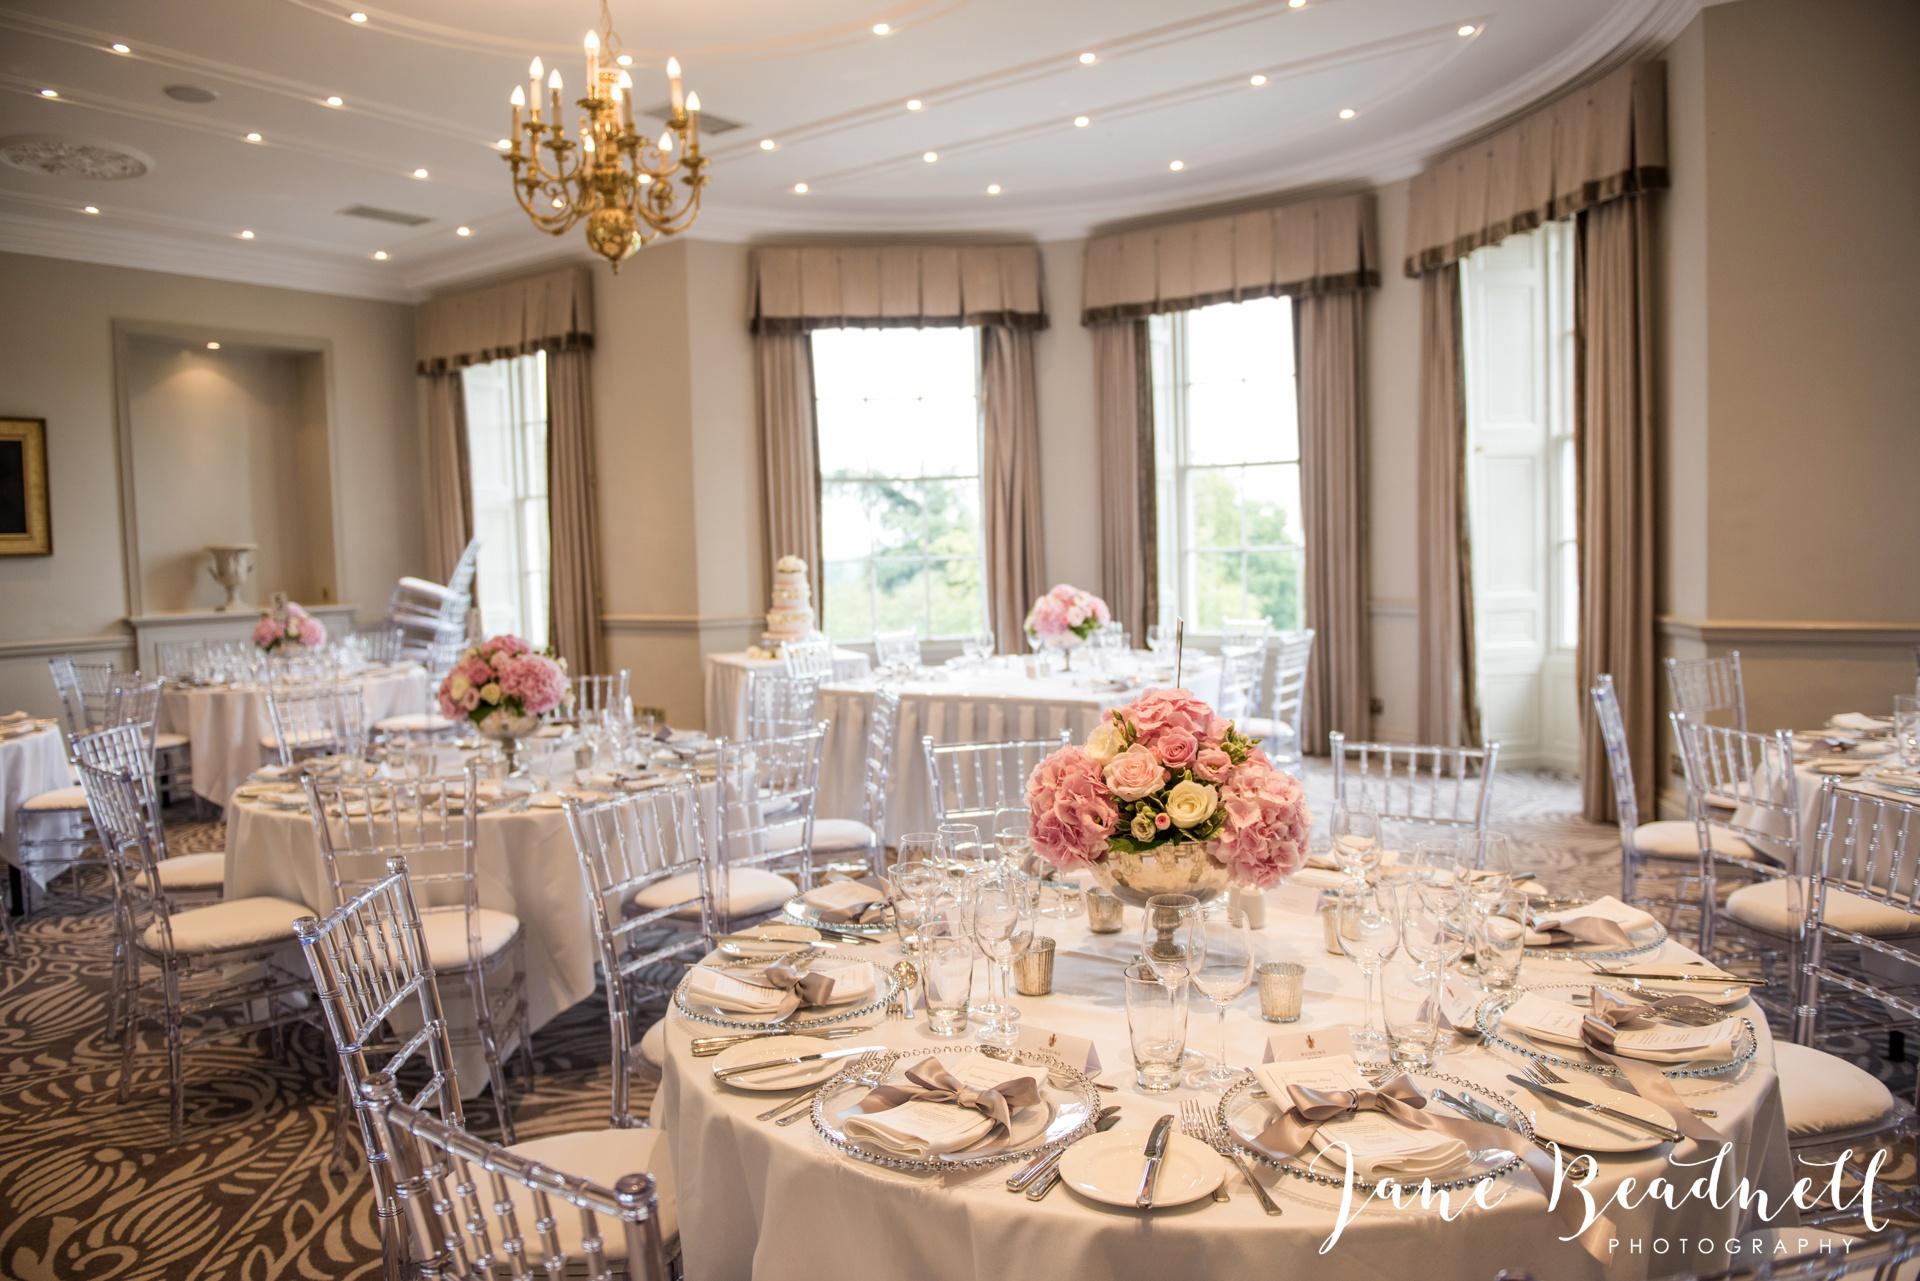 Jane Beadnell fine art wedding photographer Rudding Park Harrogate_0048